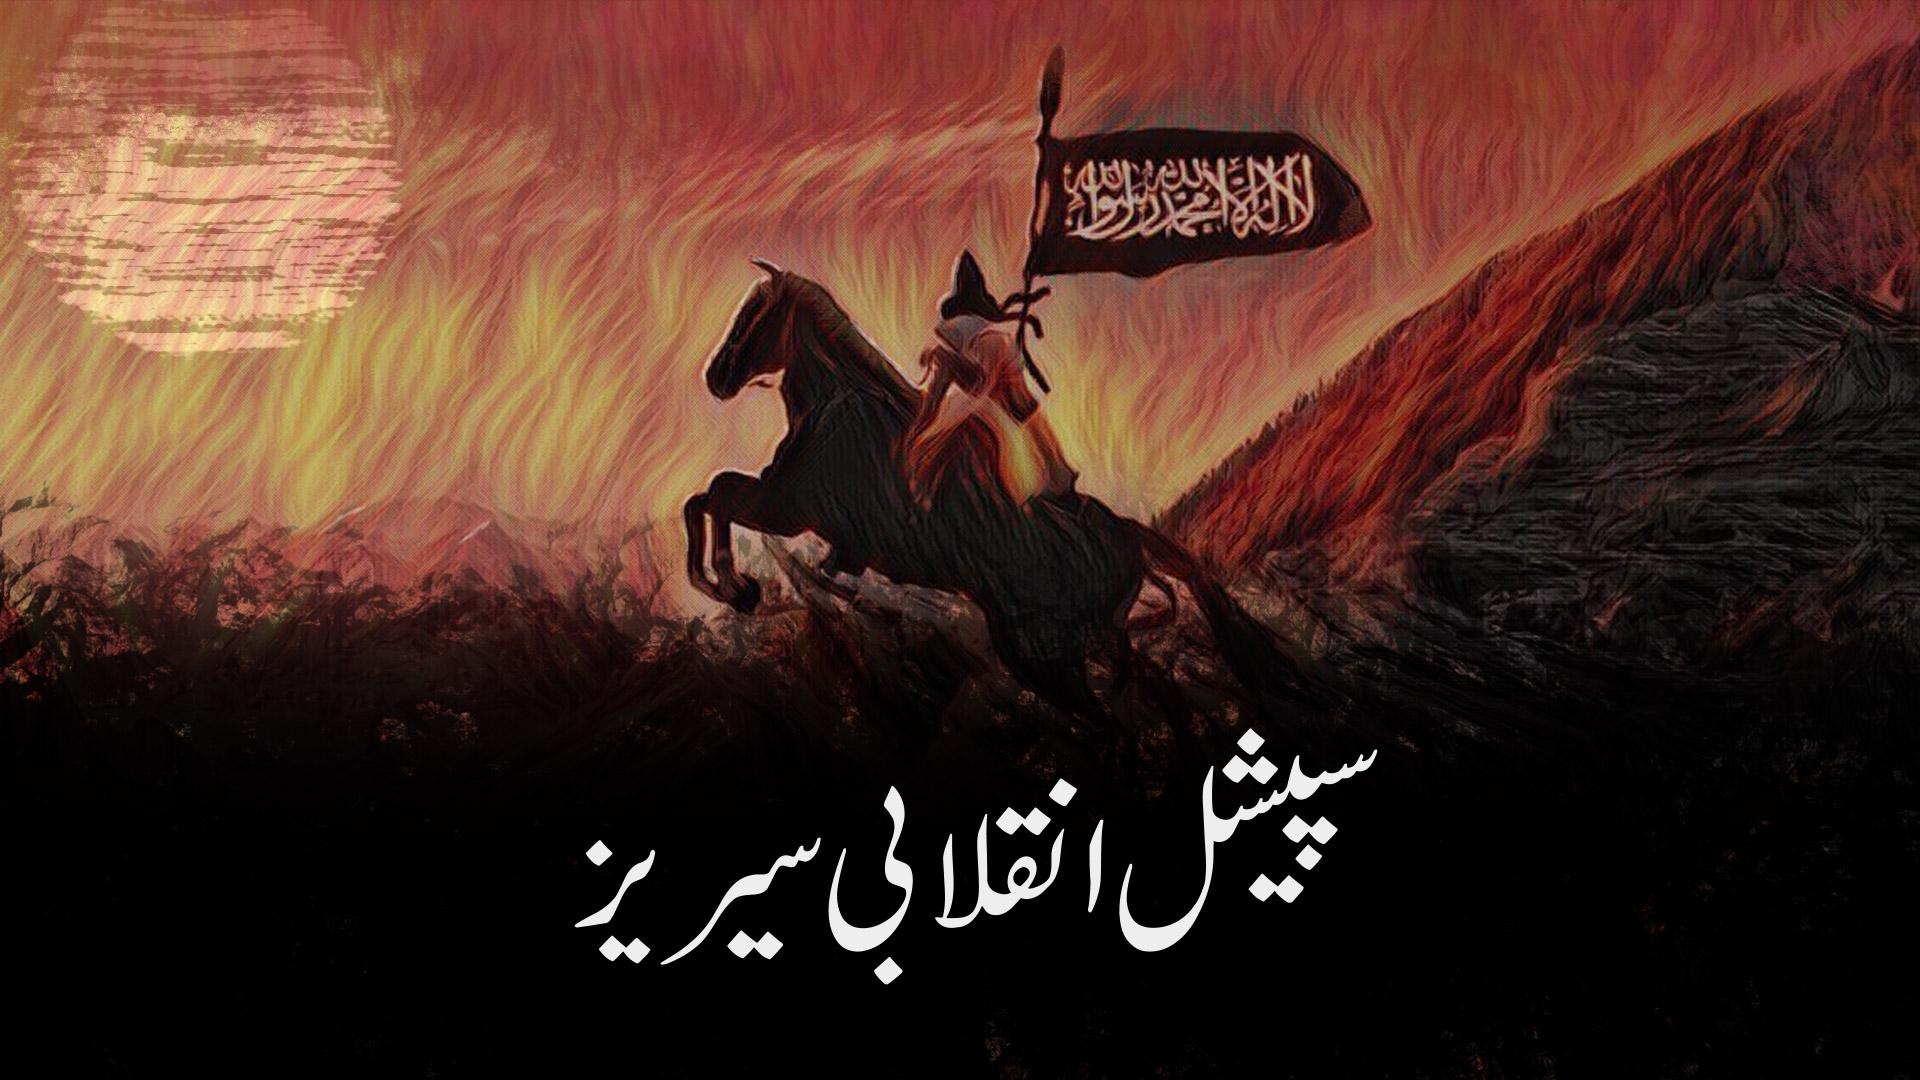 Quran-Mei-Akhri-Dour-Se-Pehle-Dunyavi-Azaab-(Corona-Virus)-Aur-Inqilab-E-Azeem-Ki-Khabar-Part-1